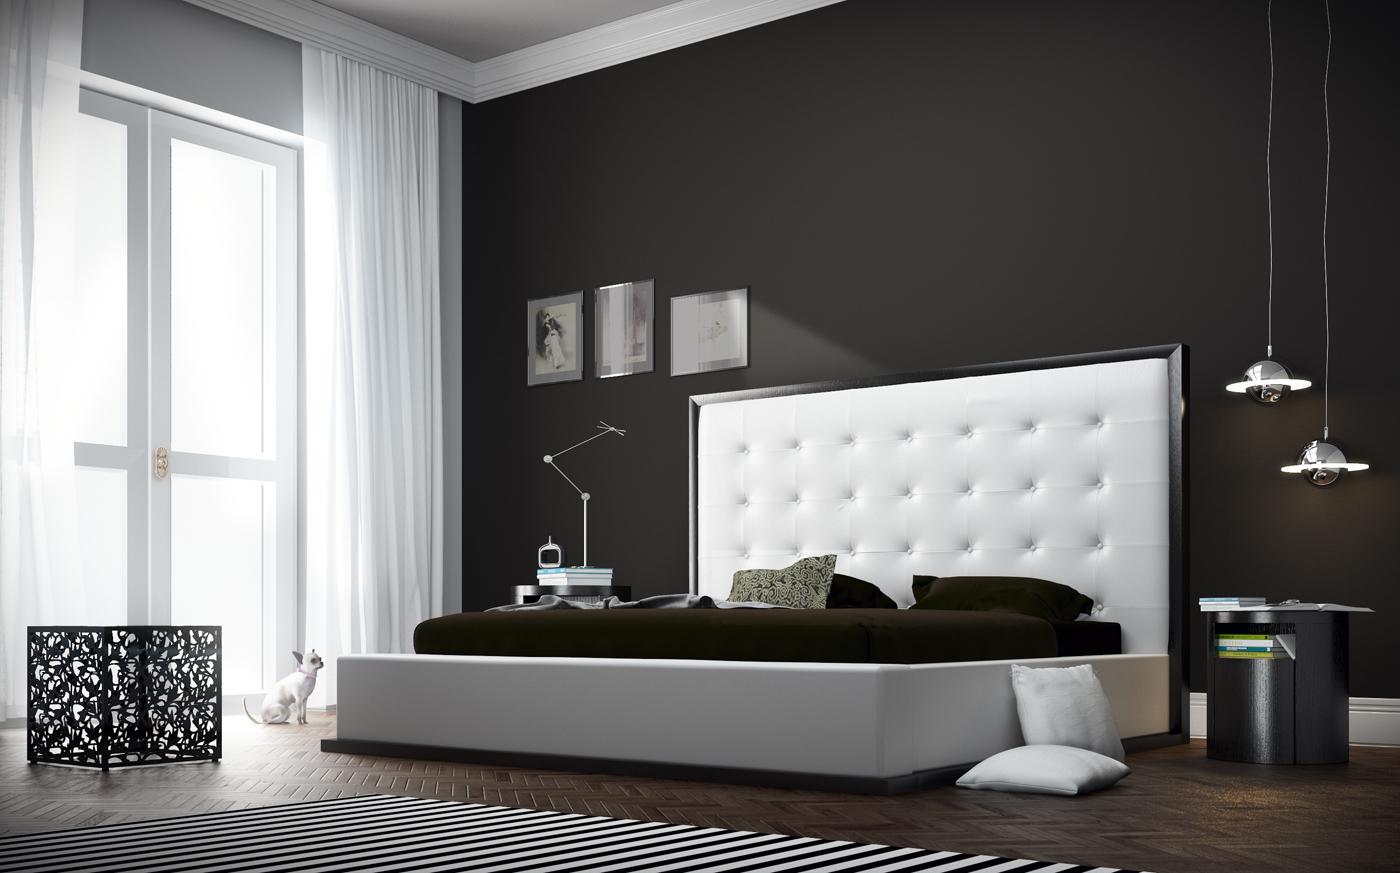 Bedroom Rug Under Bed